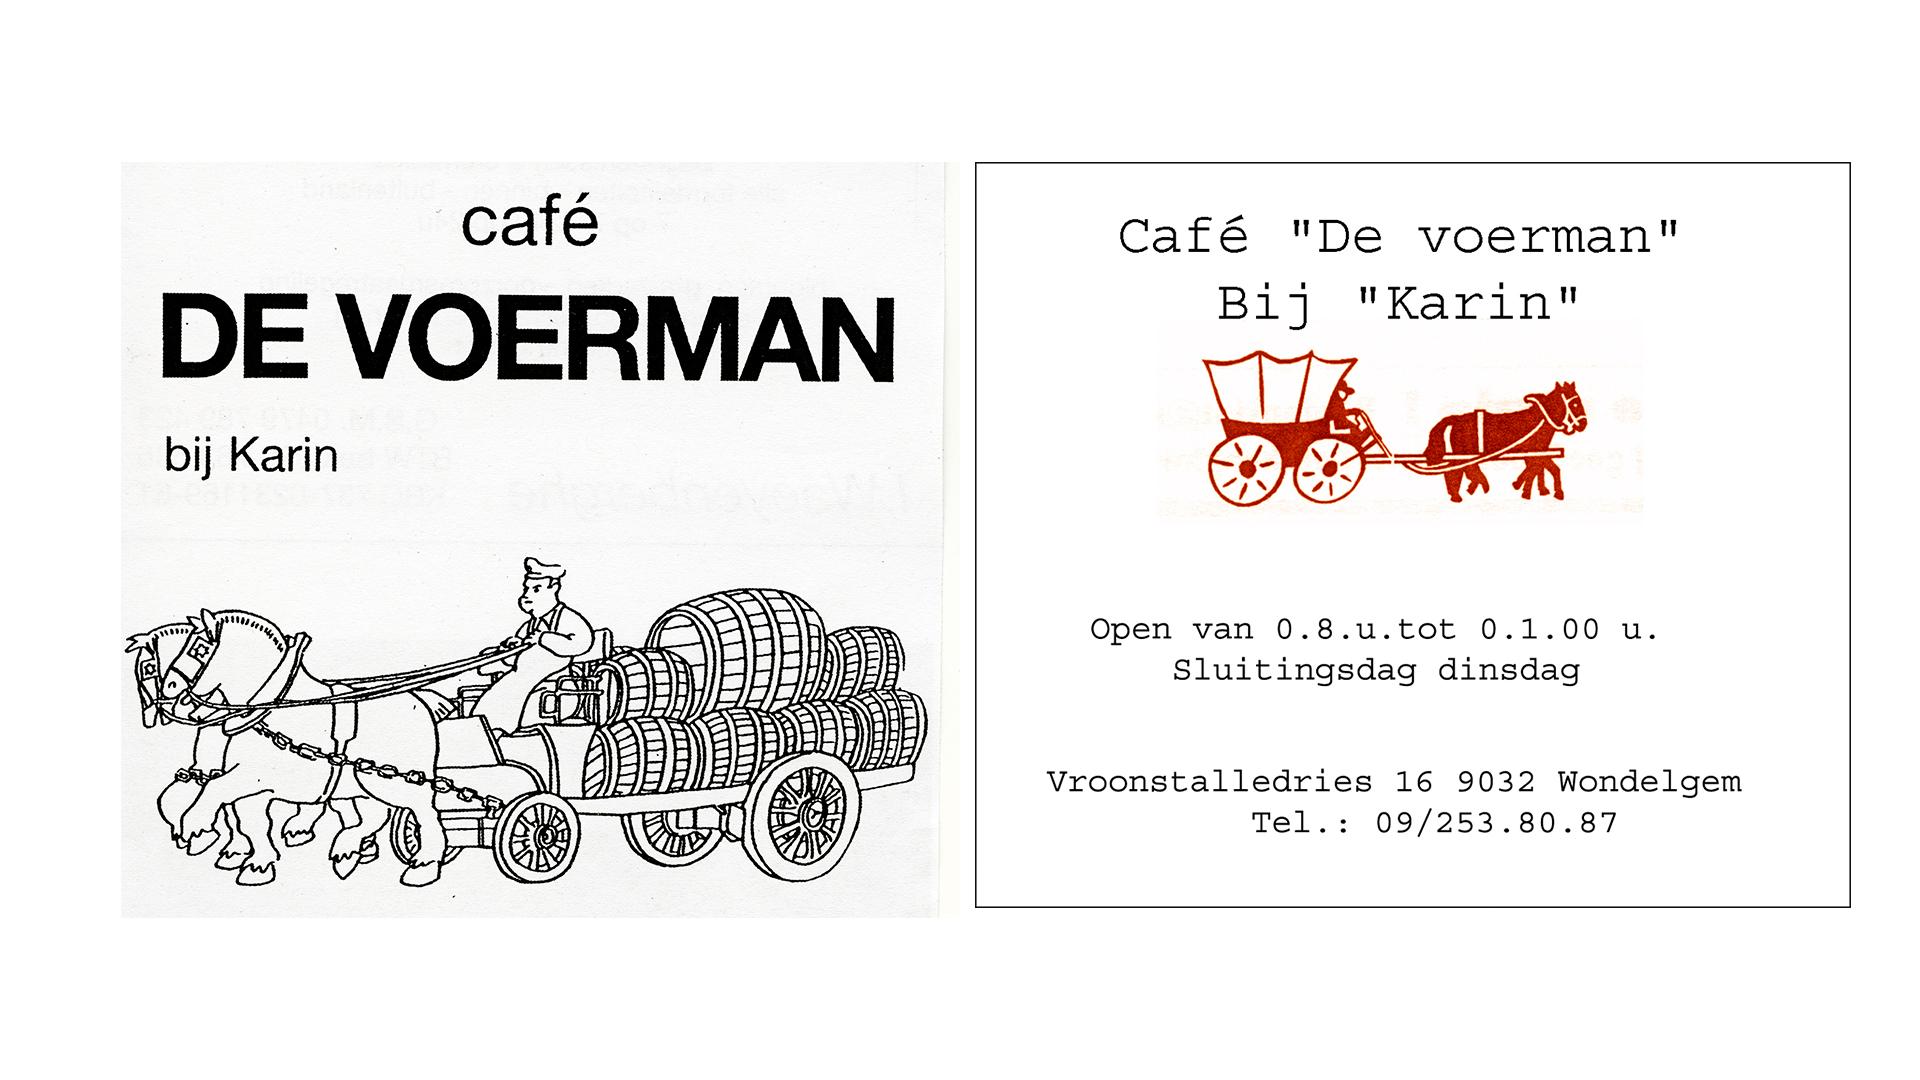 Café De Voerman